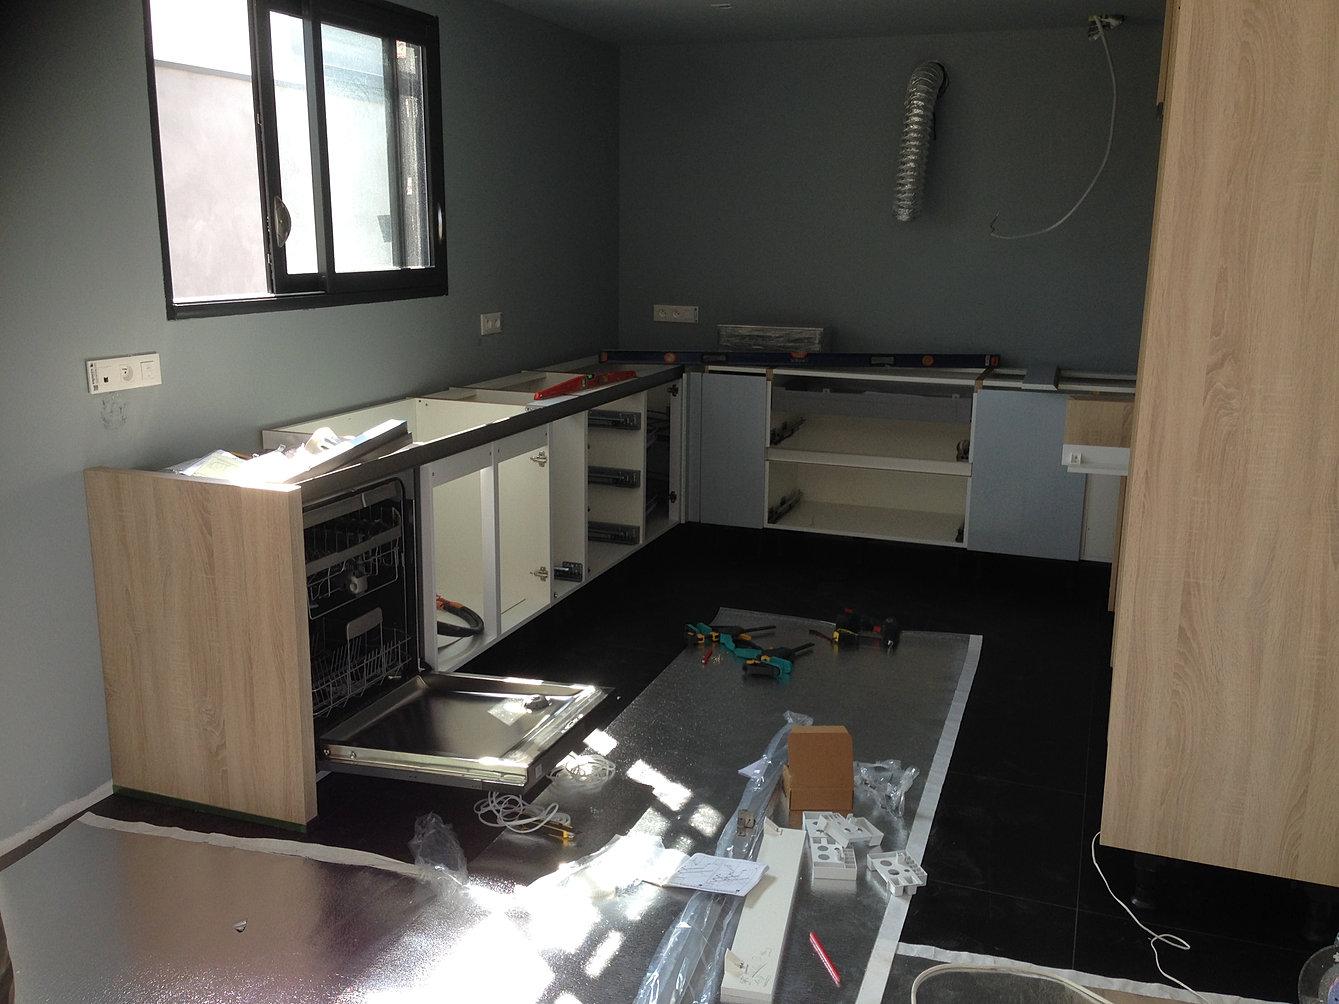 artisan cuisiniste 44 beautiful batiman gurande la baule pornichet accompagne votre projet de a. Black Bedroom Furniture Sets. Home Design Ideas